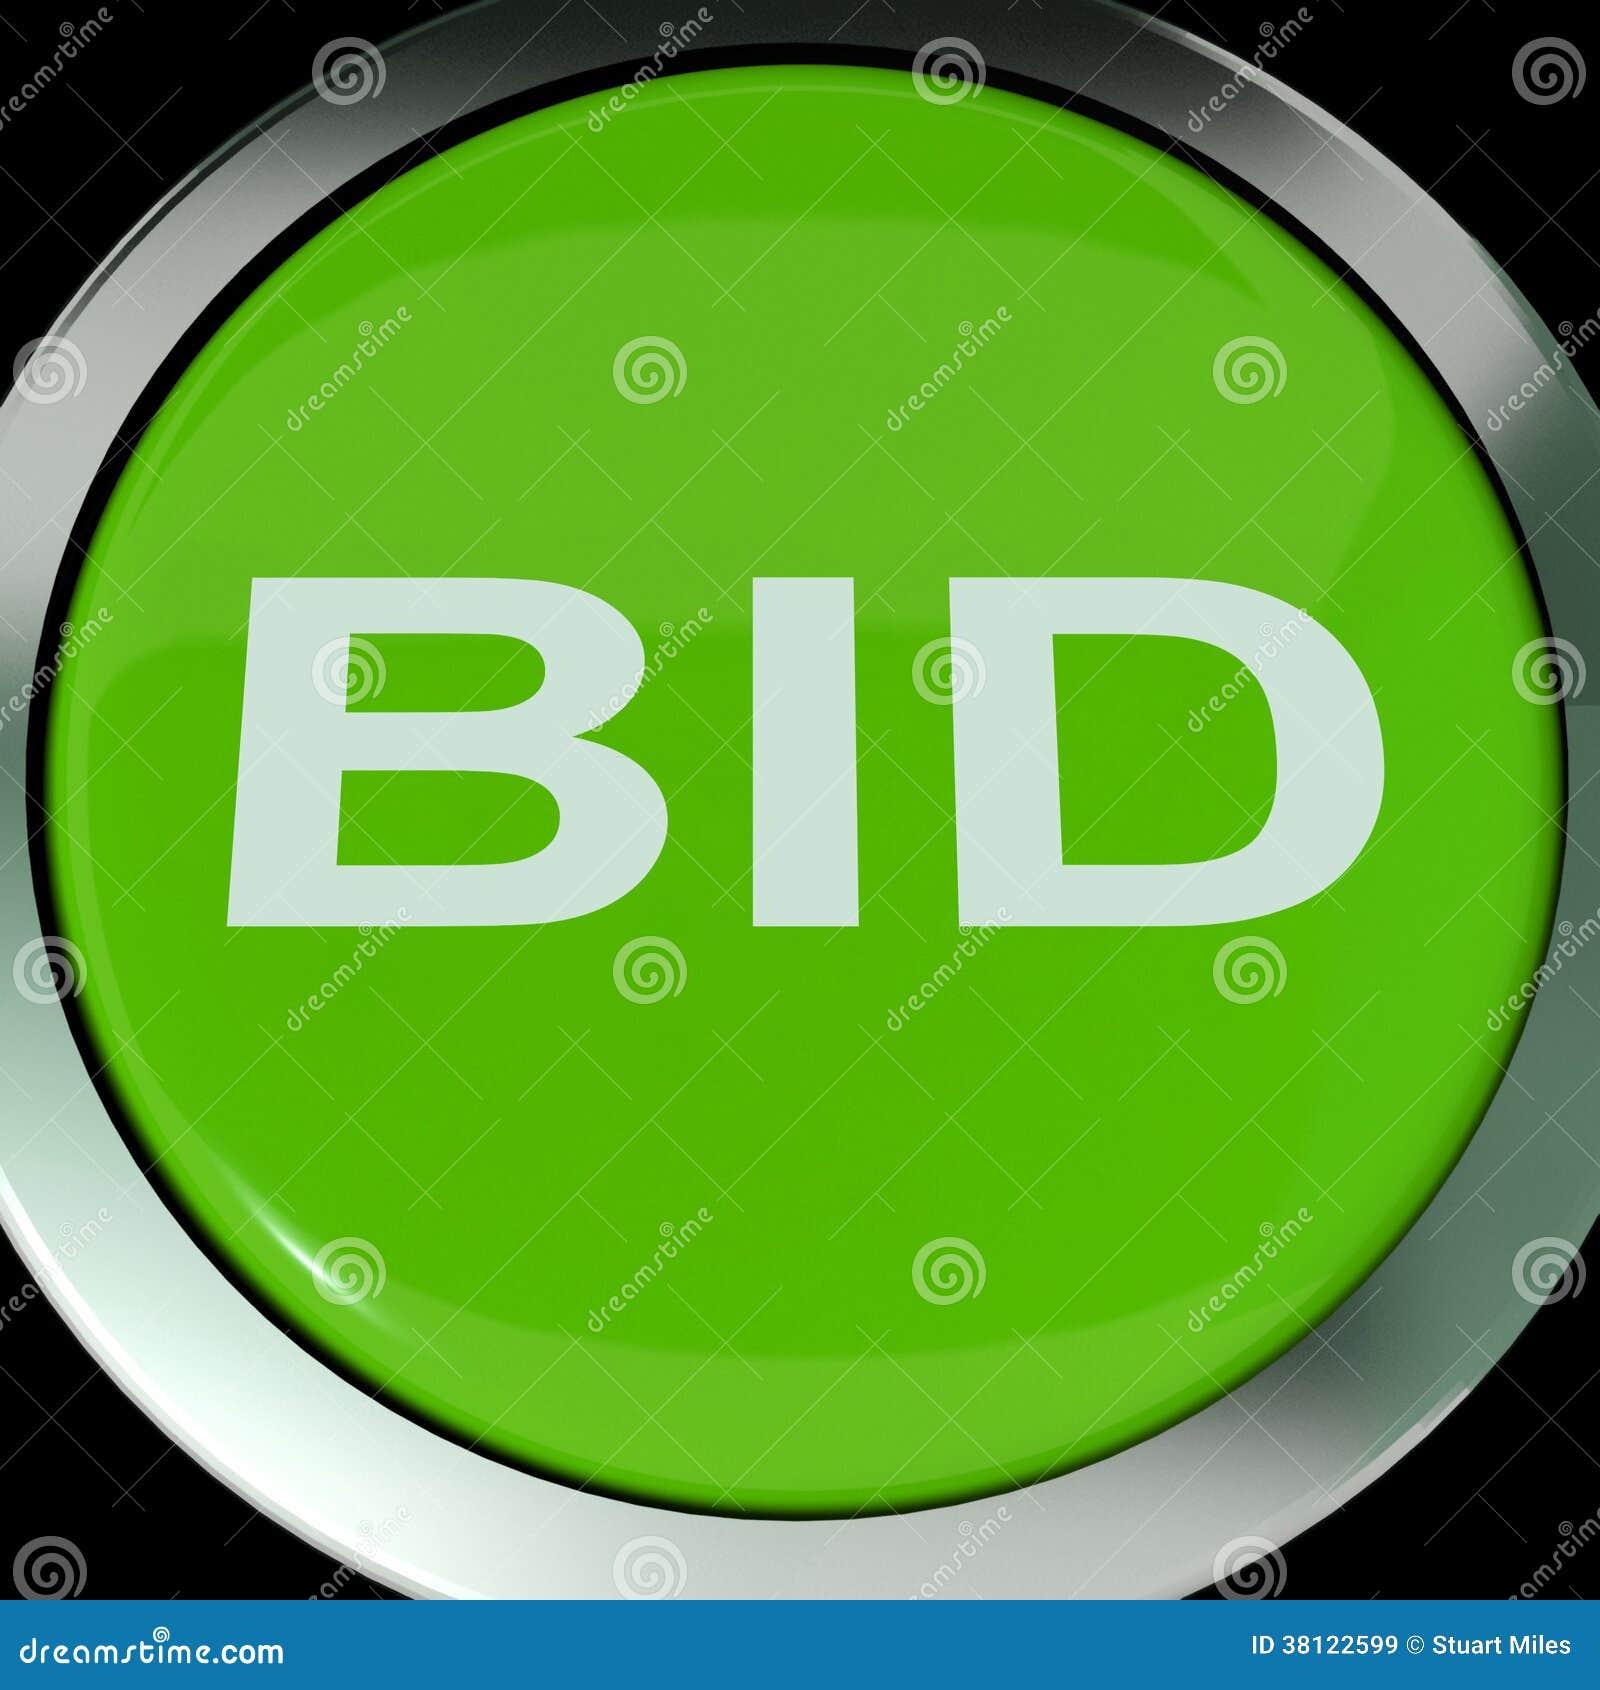 Online Furniture Auction Sites